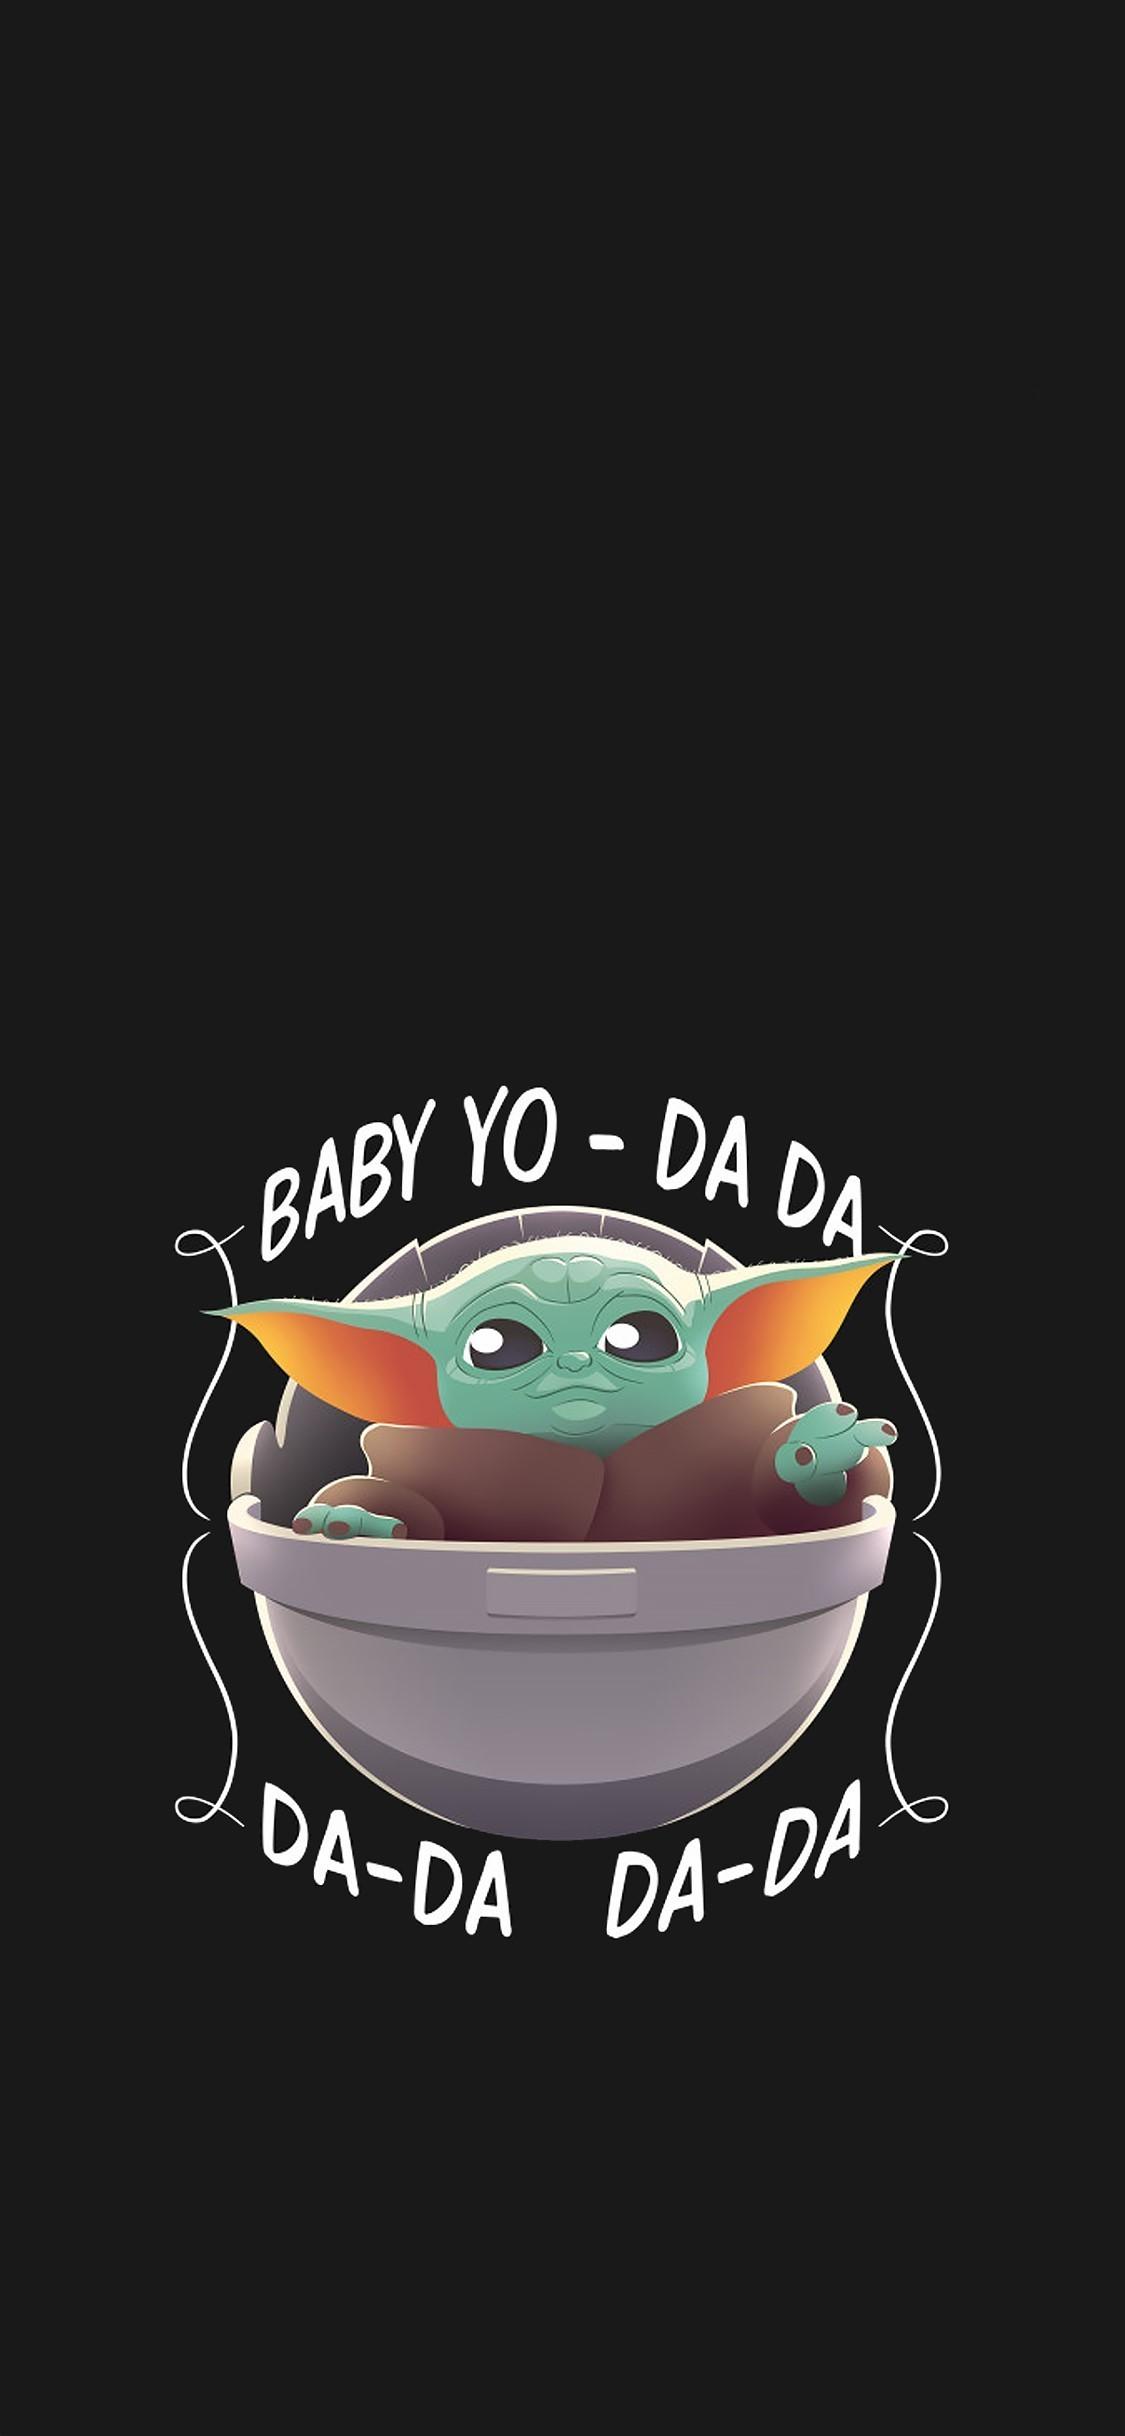 Iphone Baby Yoda Wallpaper Kolpaper Awesome Free Hd Wallpapers